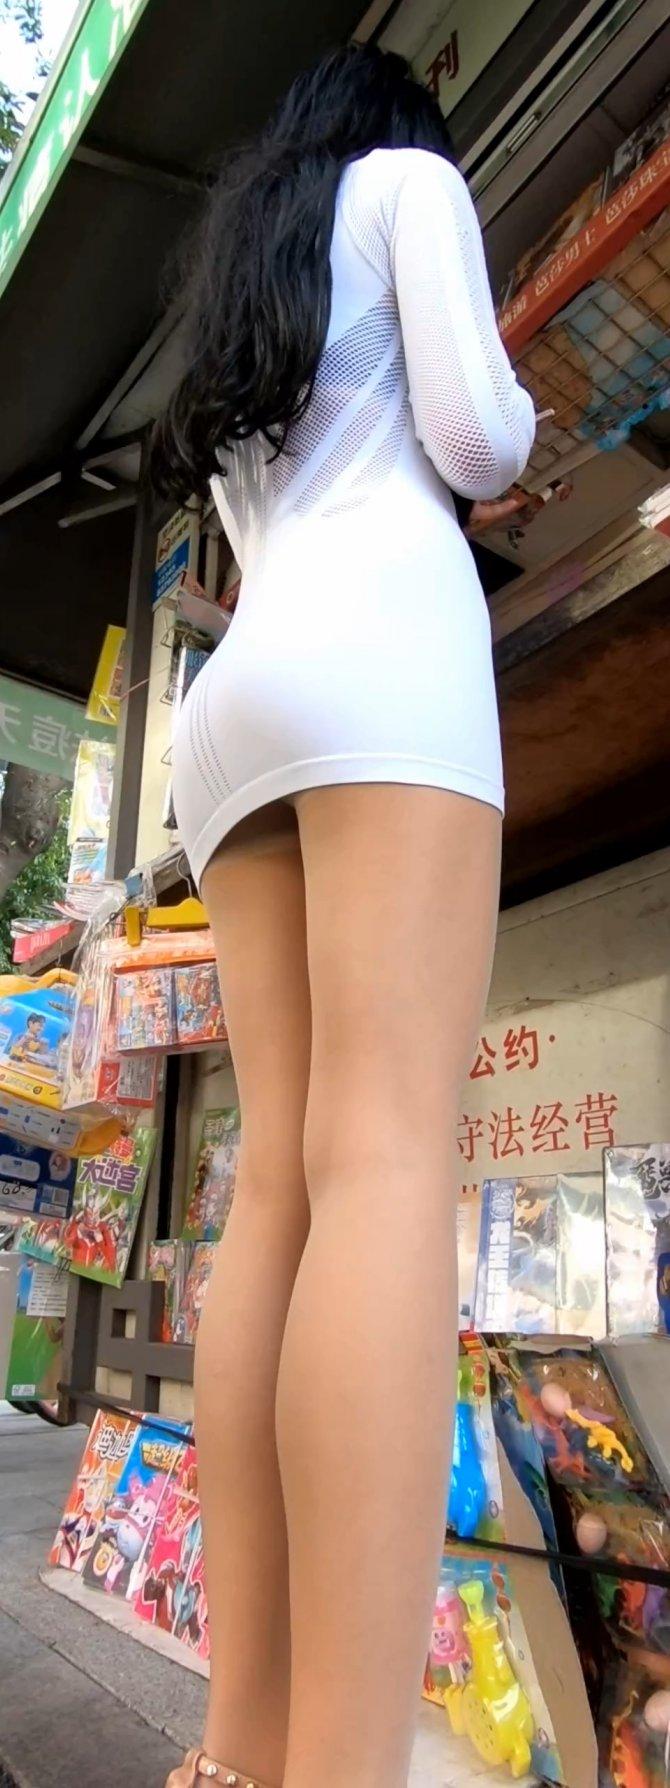 [9P][御风作品87][子涵妹妹 白色短裙随拍][2K][1.23G]